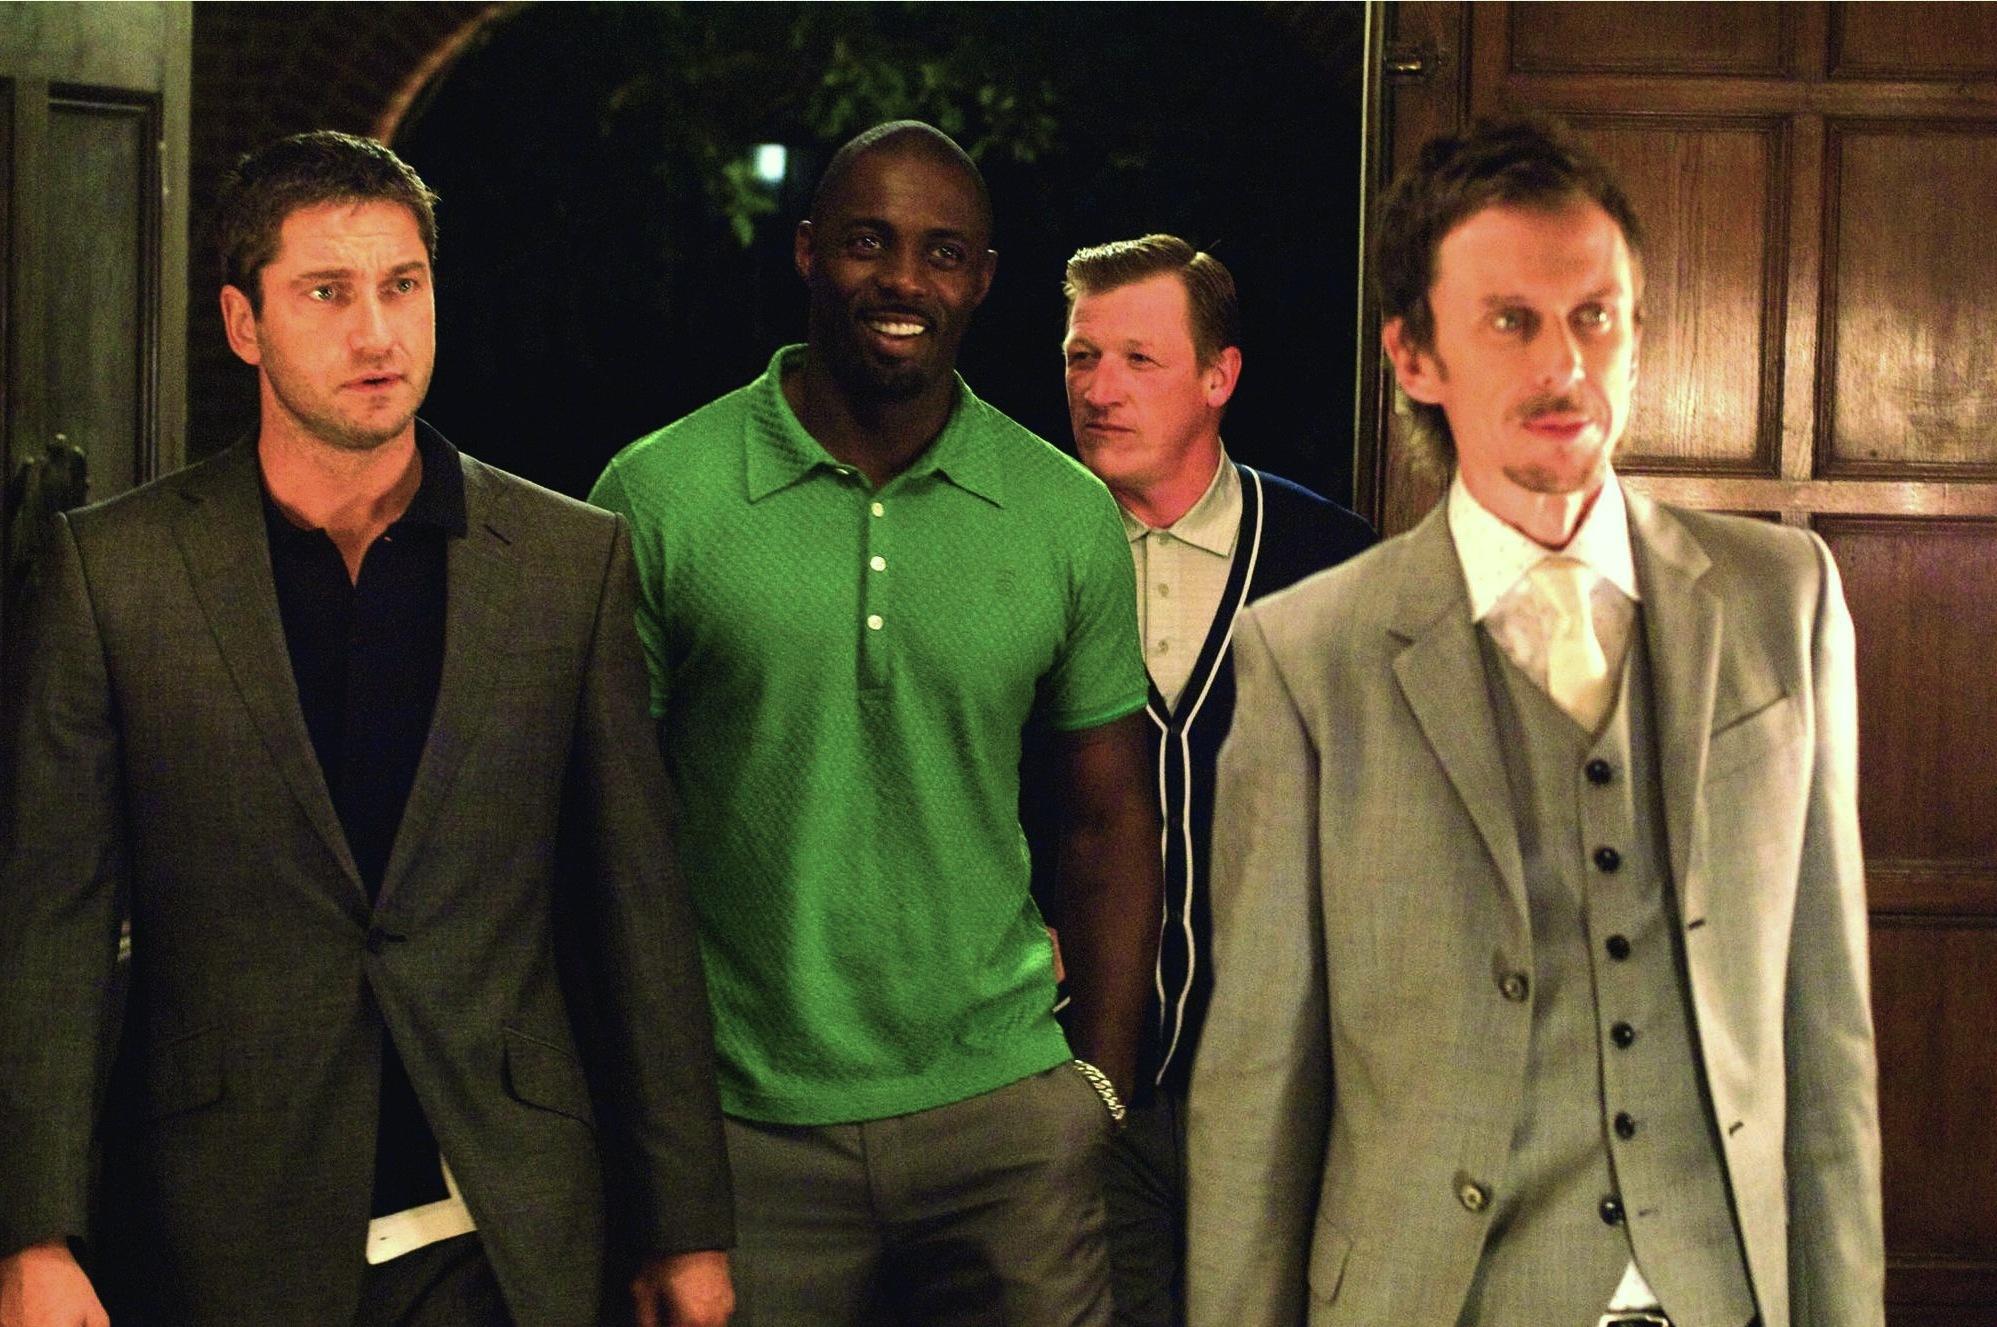 Gerard Butler, Idris Elba, and Geoff Bell in RocknRolla (2008)